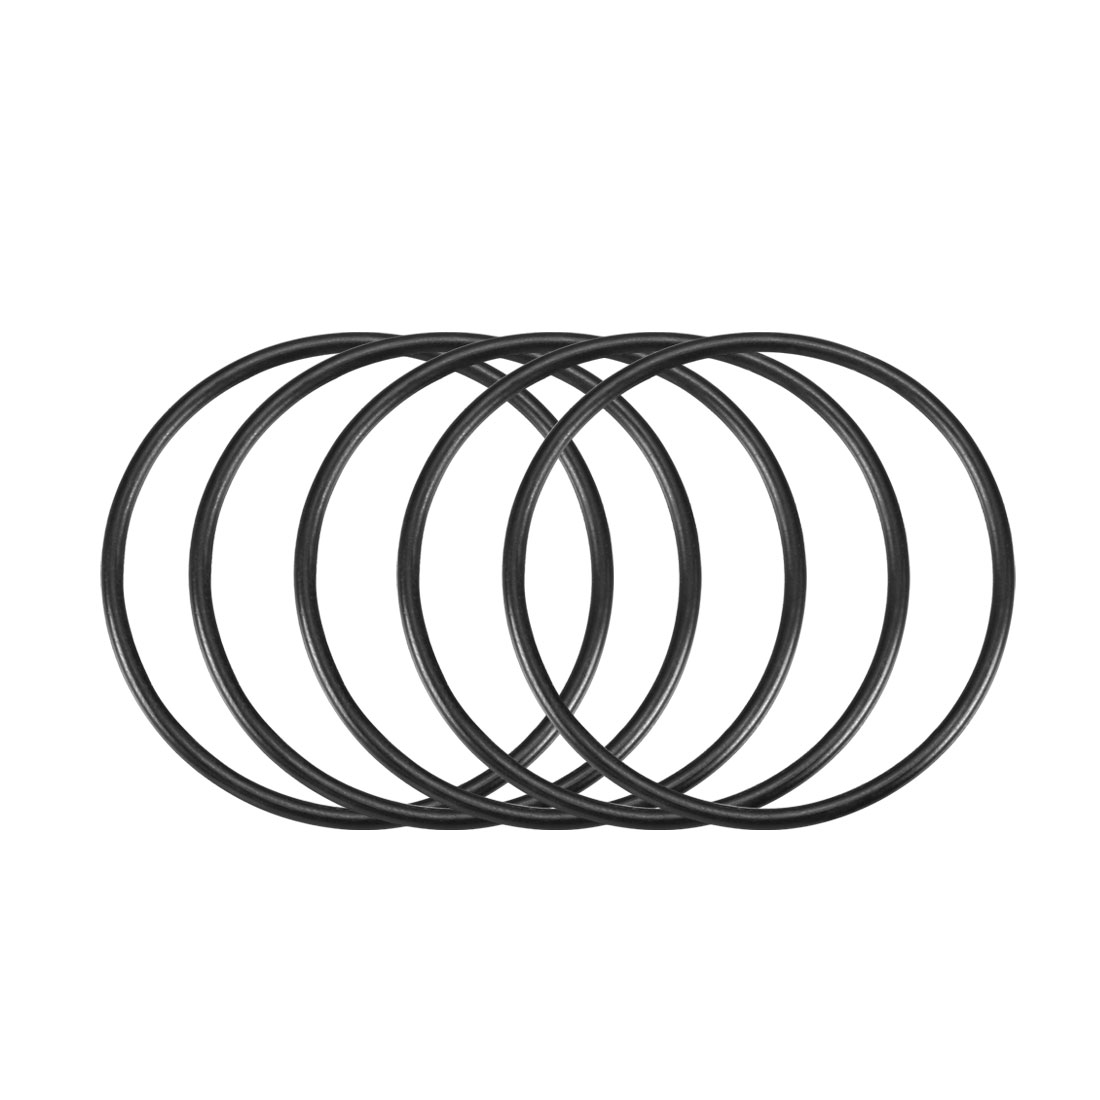 30Pcs Black 44 x 2mm Industrial Flexible Rubber O Ring Oil Sealing Grommets